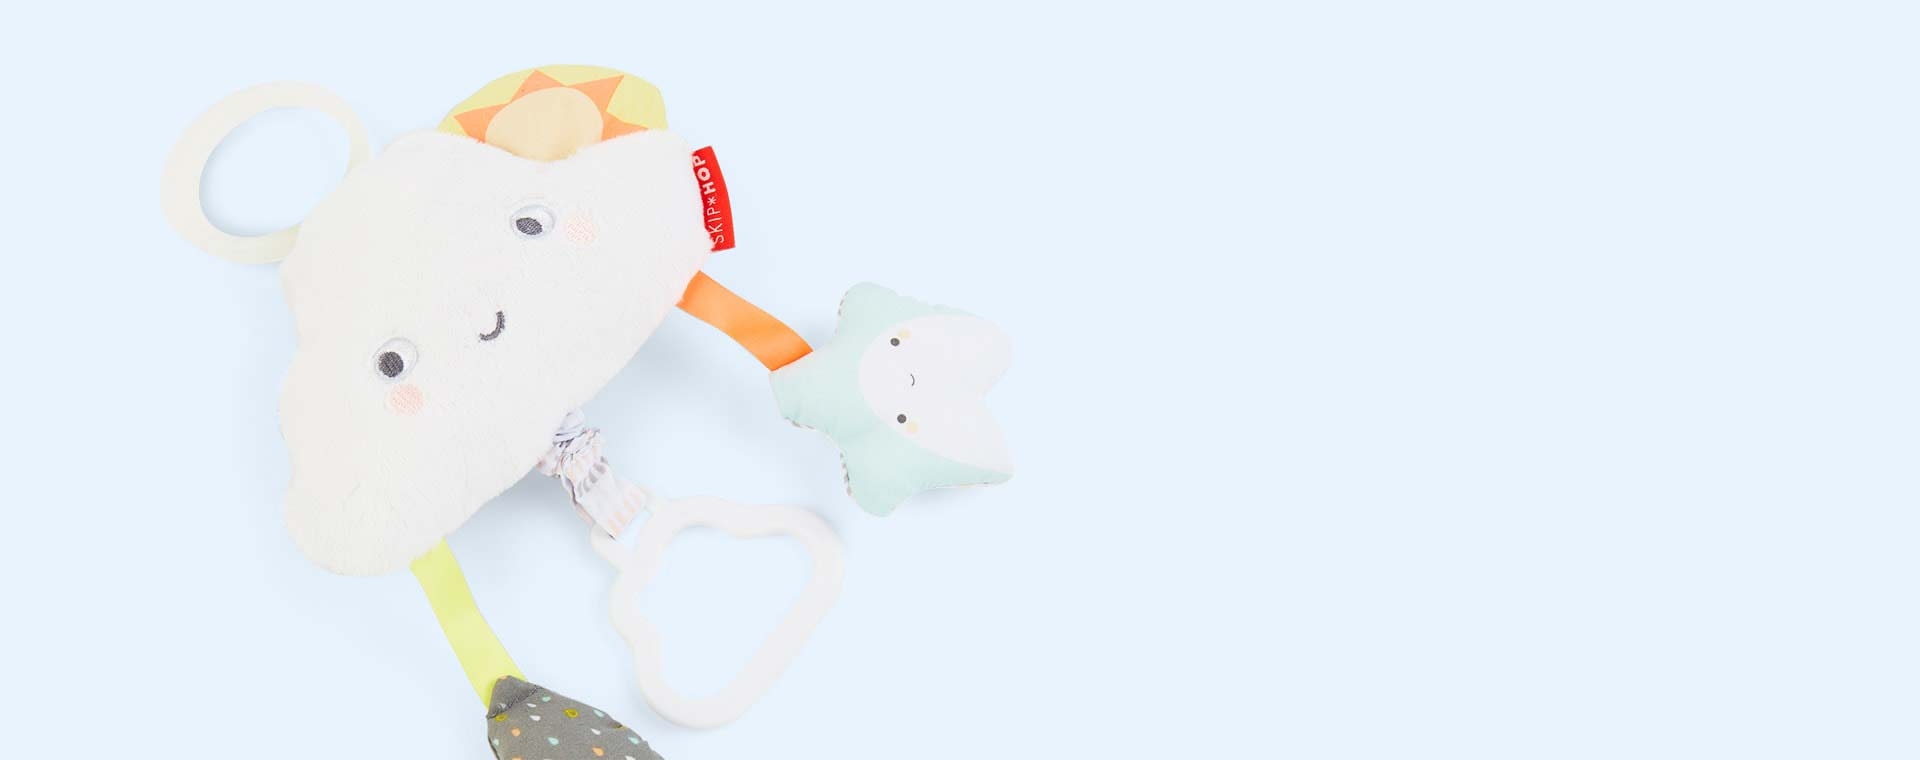 Cloud Skip Hop Silver Lining Cloud Jitter Stroller Baby Toy